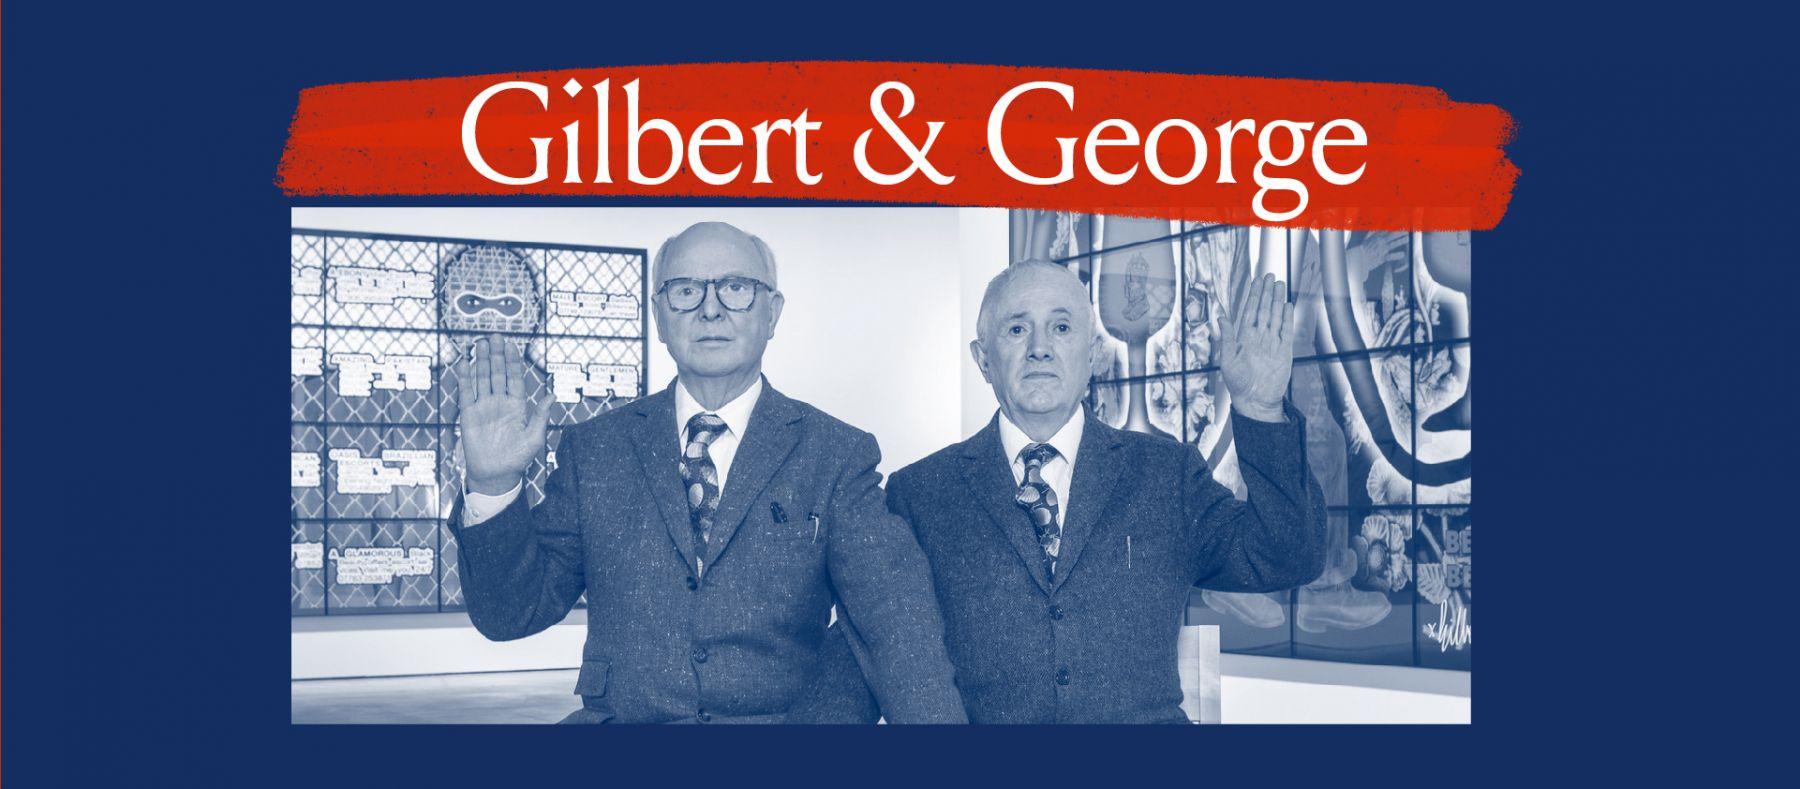 Gilbert & George Portrait Banner